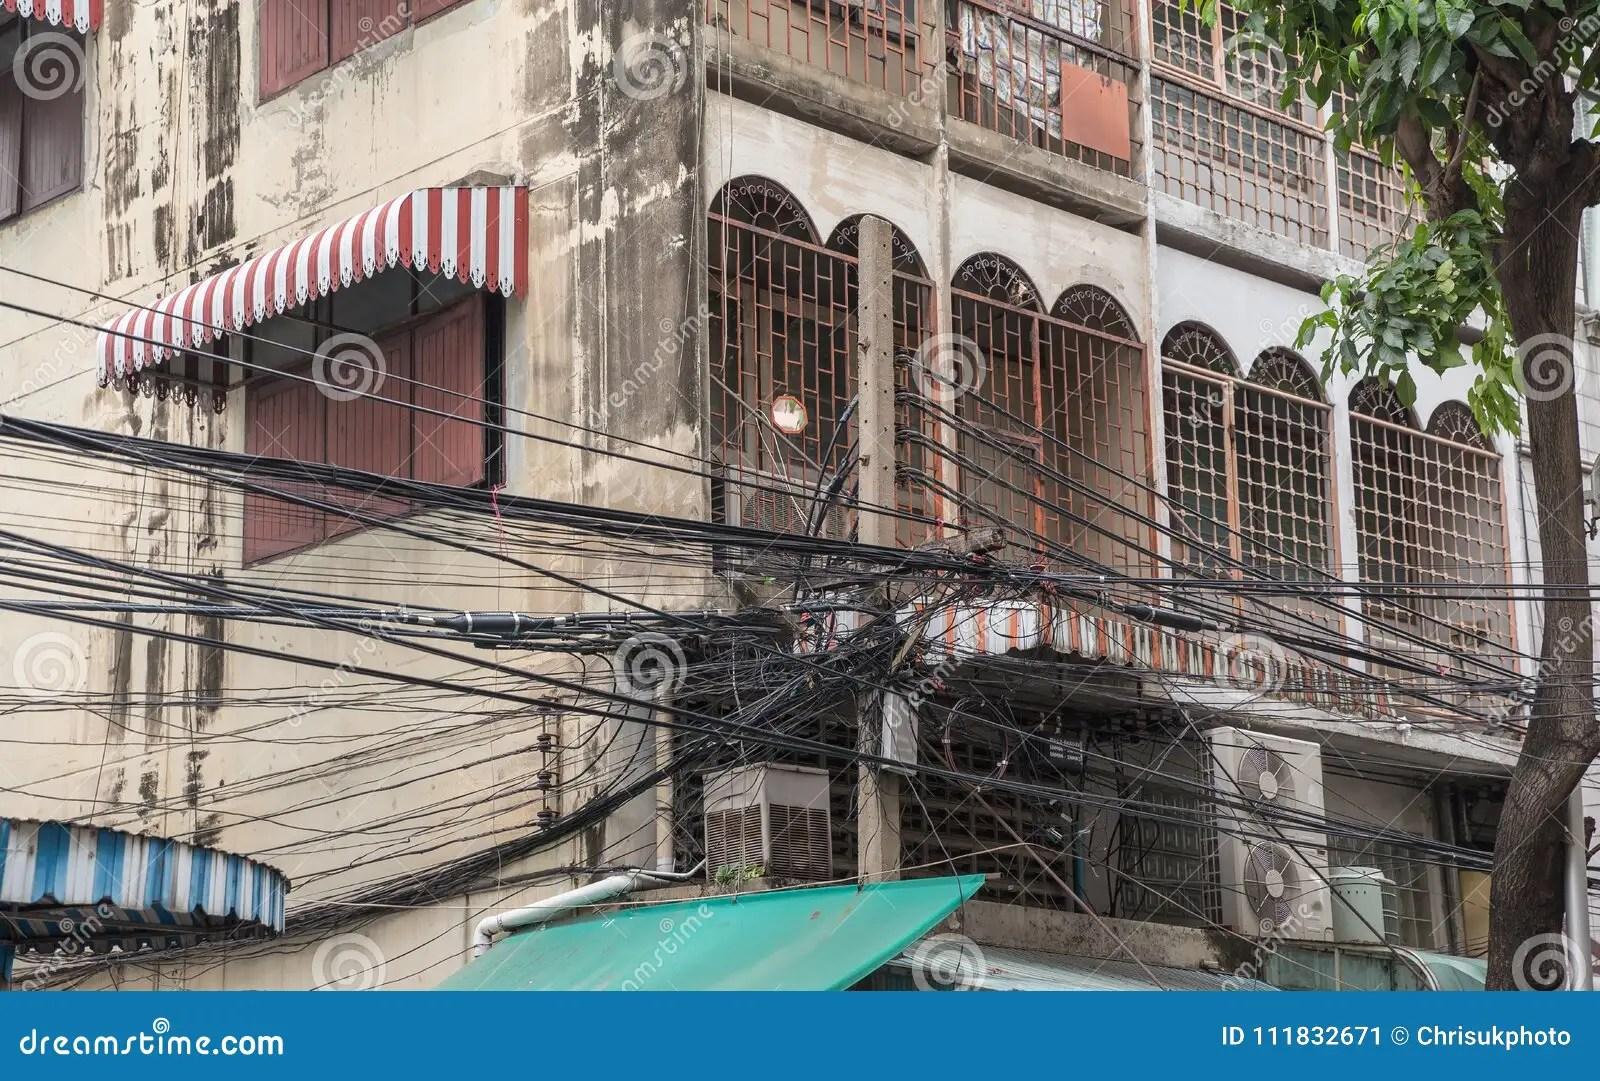 hight resolution of crazy wiring in bangkok